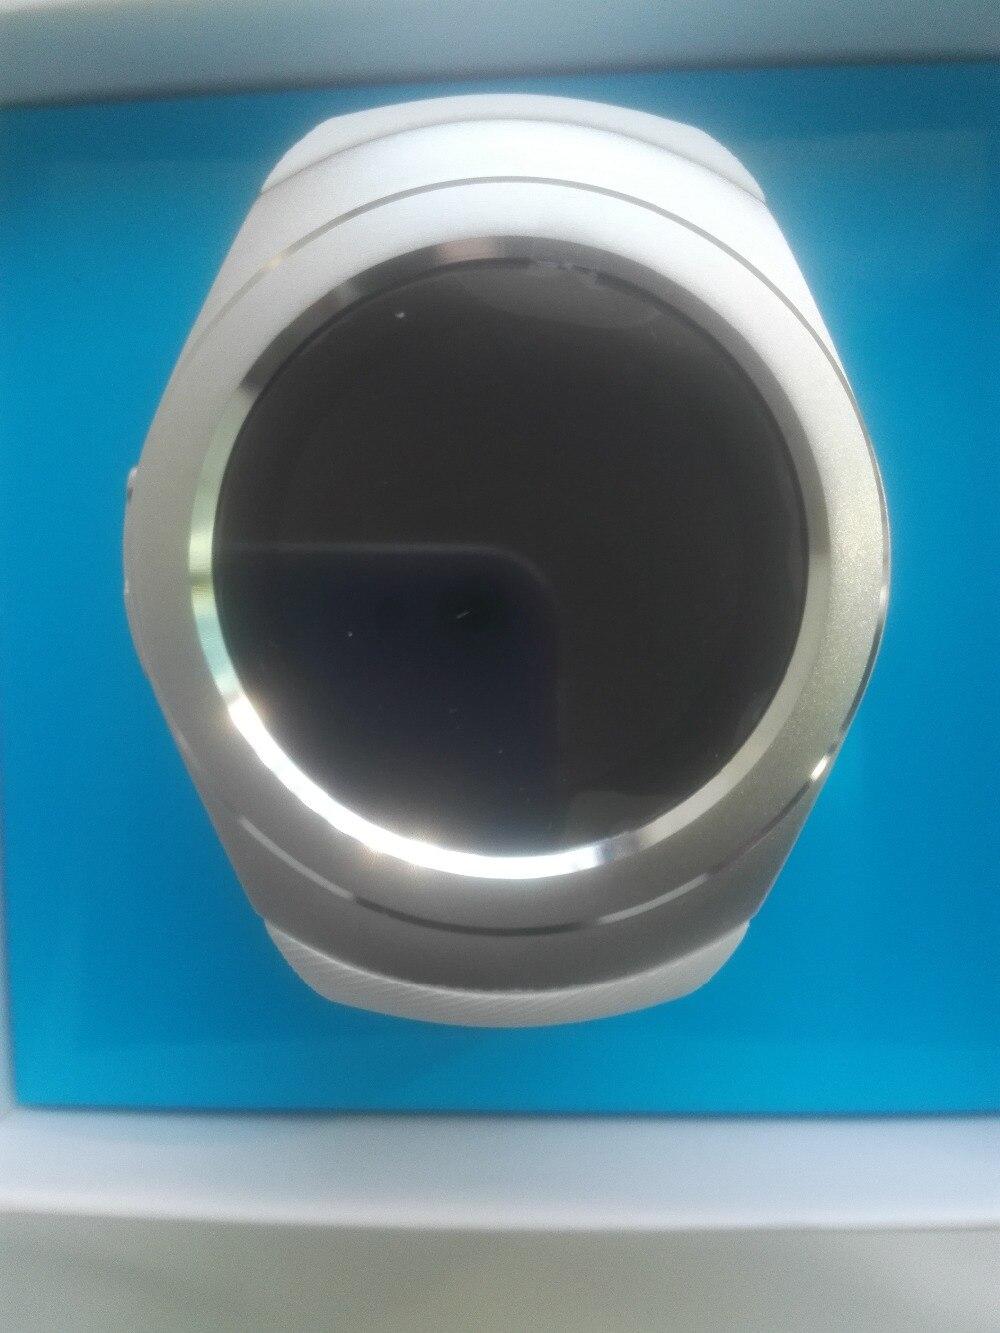 T11pro nano sim y bluetooth smart watch pantalla ips monitor sleep podómetro ras